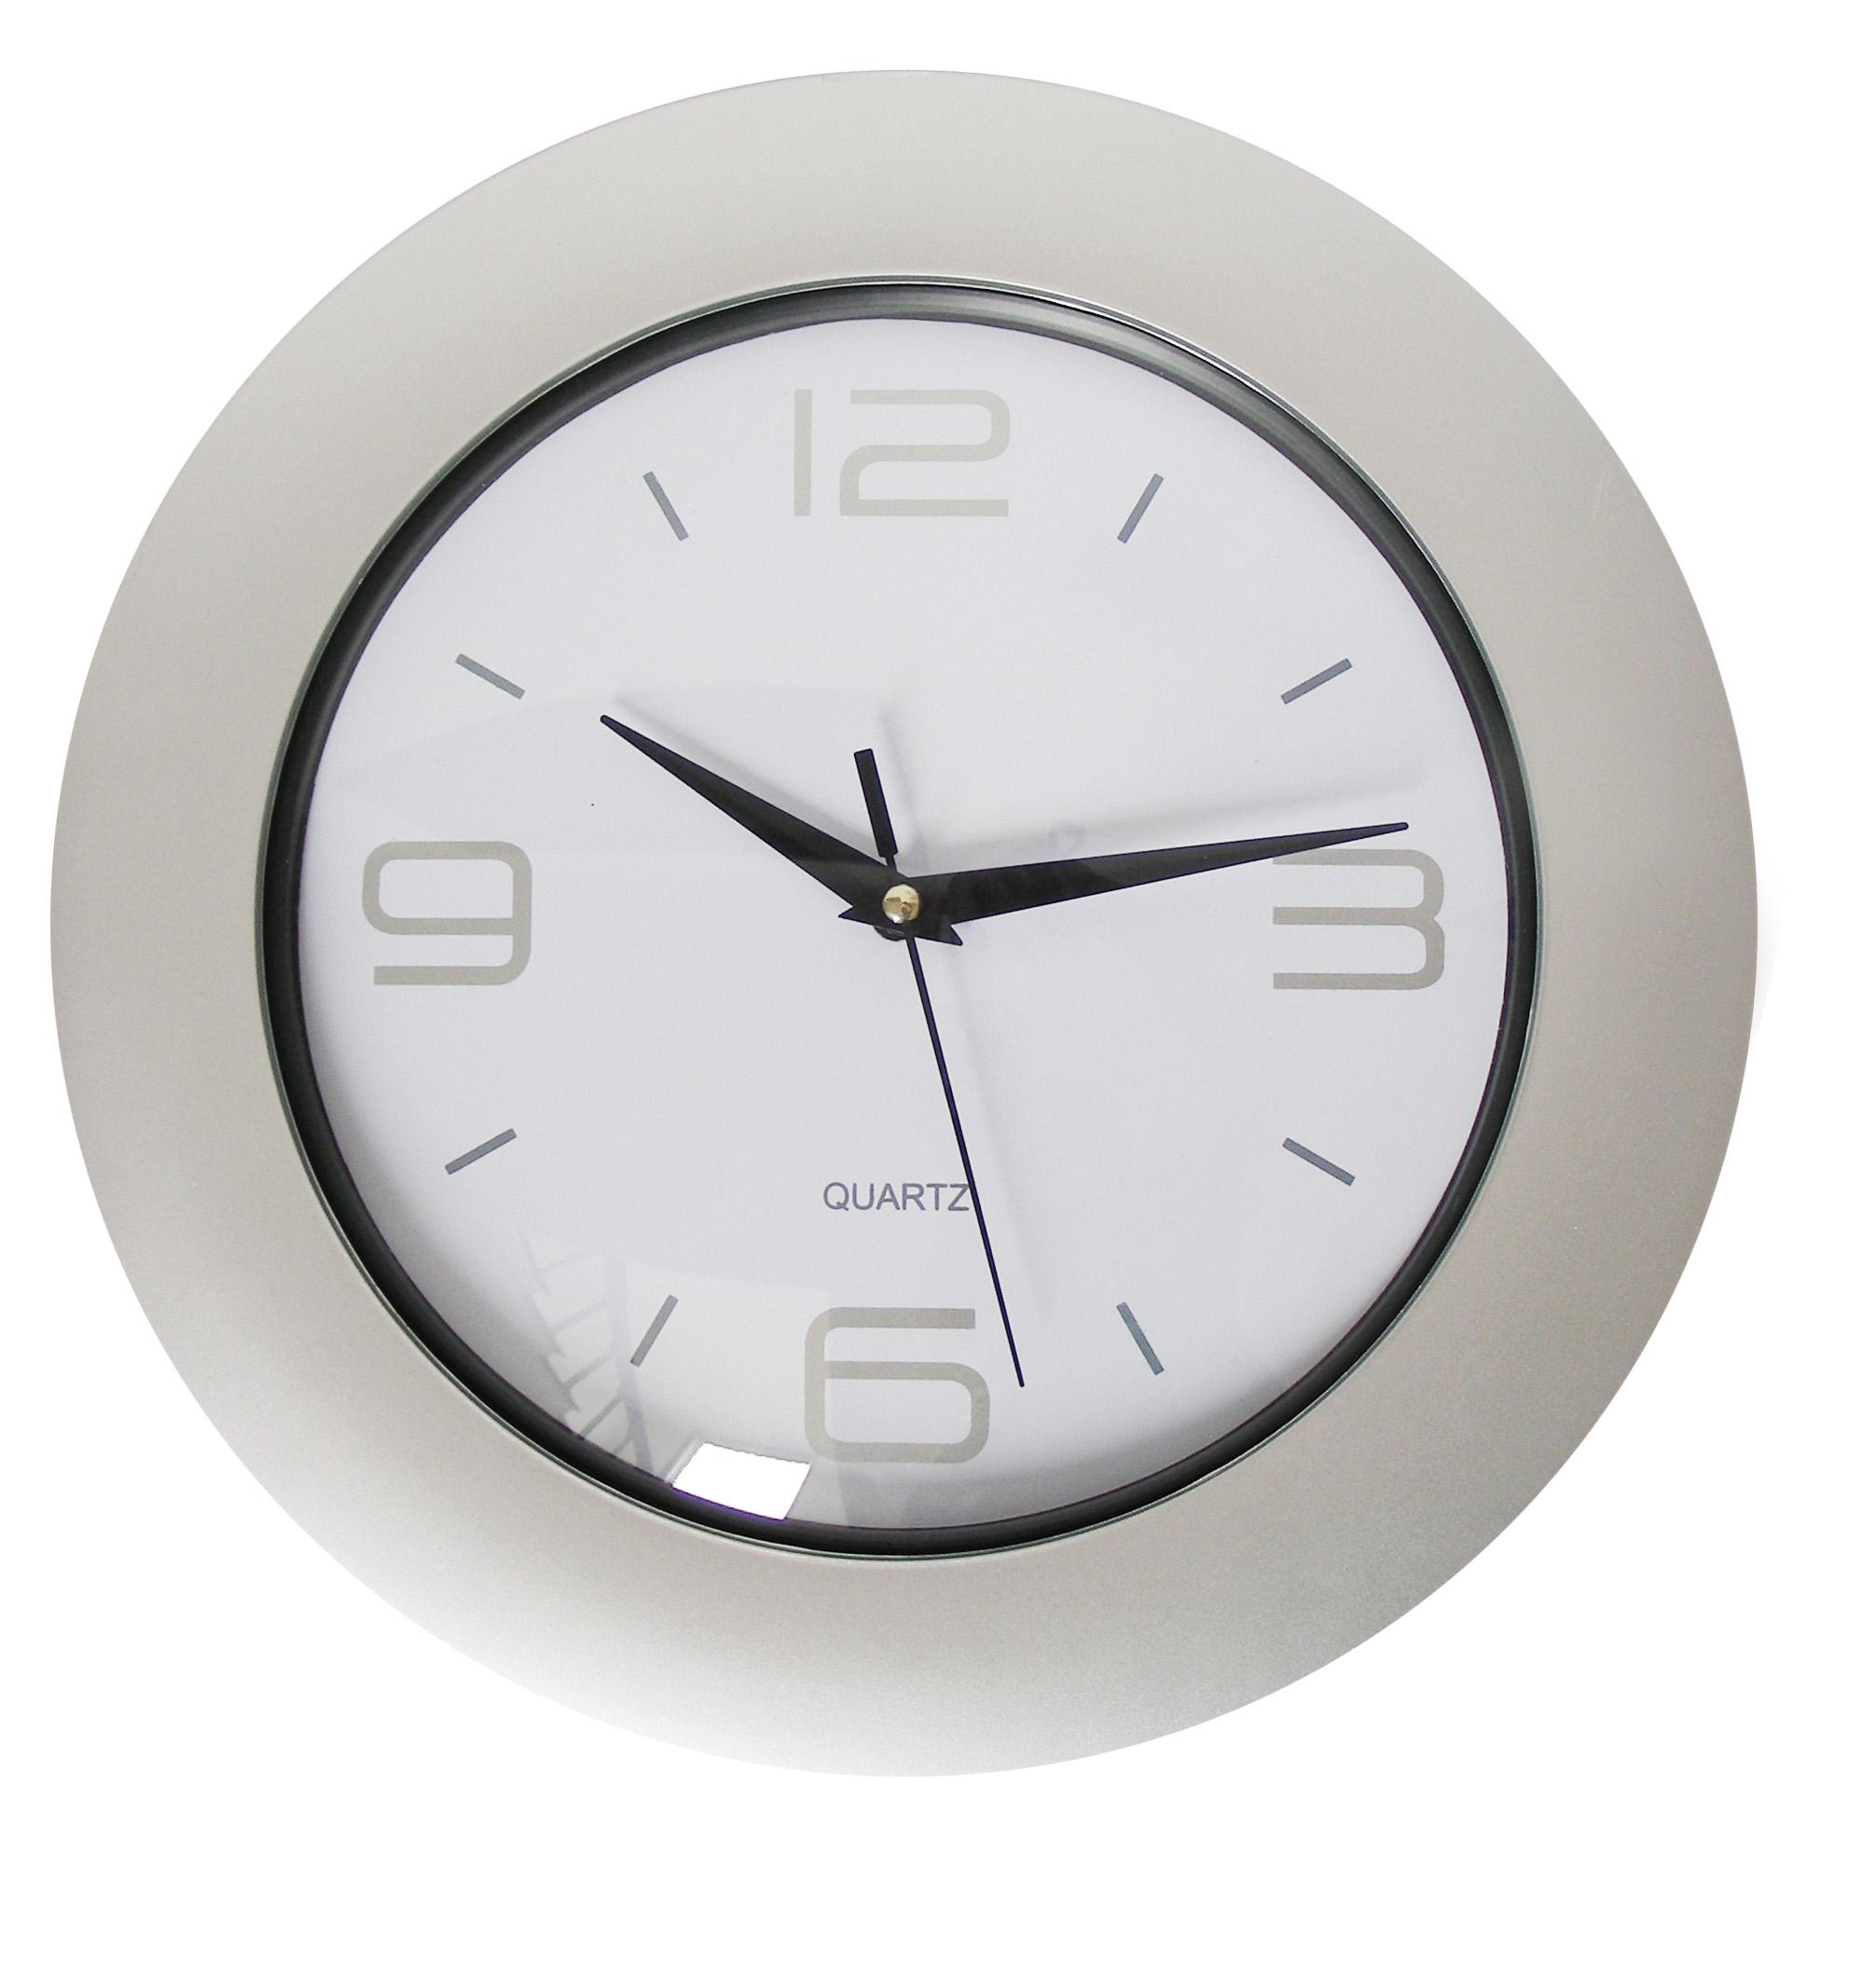 Reloj de pared kaichile regalos publicitarios - Relojes de pared ...